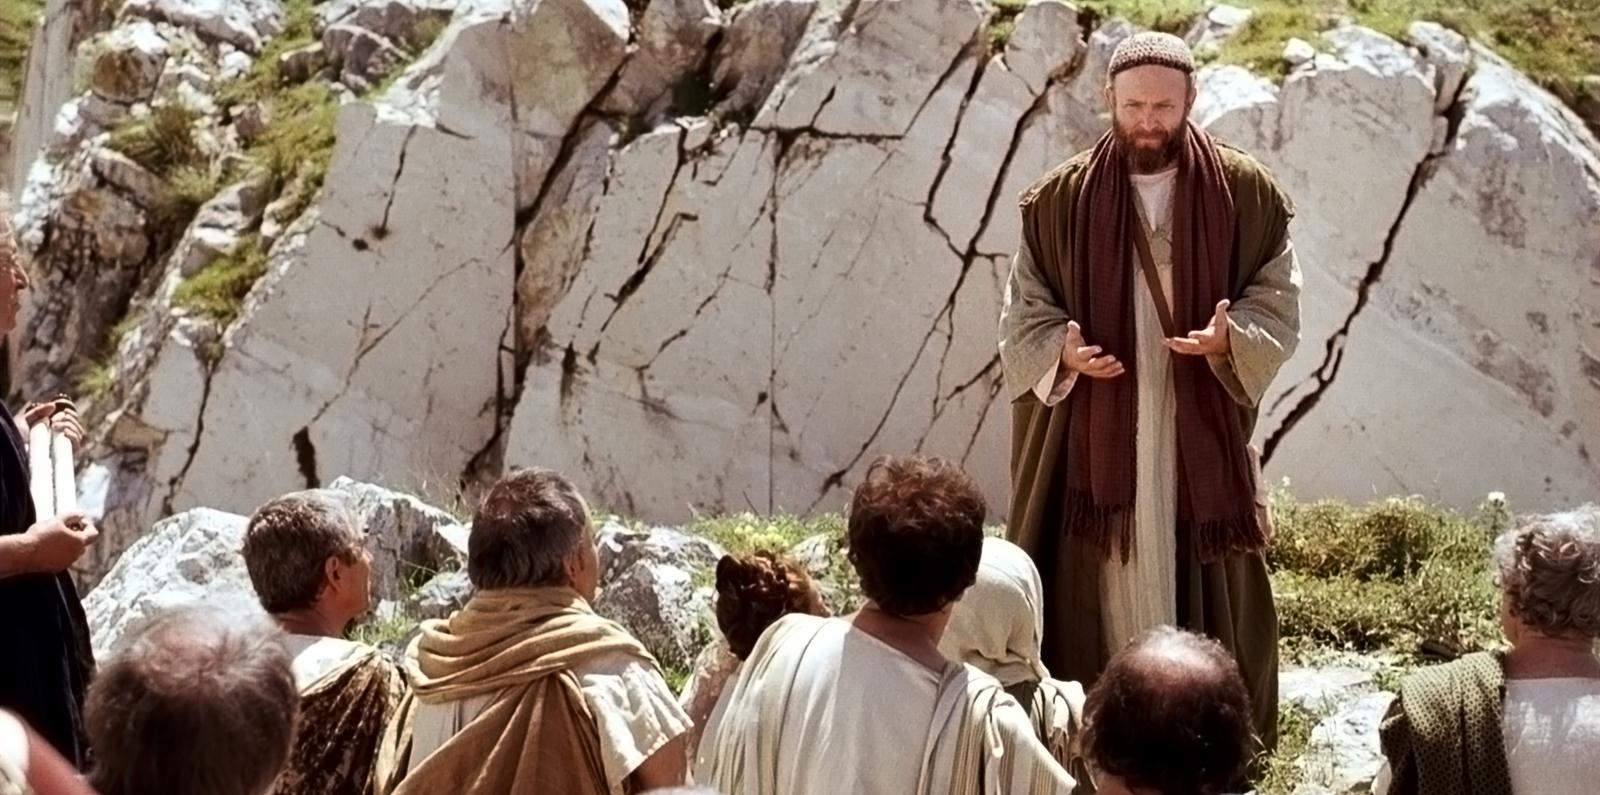 29 Jul. 22—28: Acts 16—21